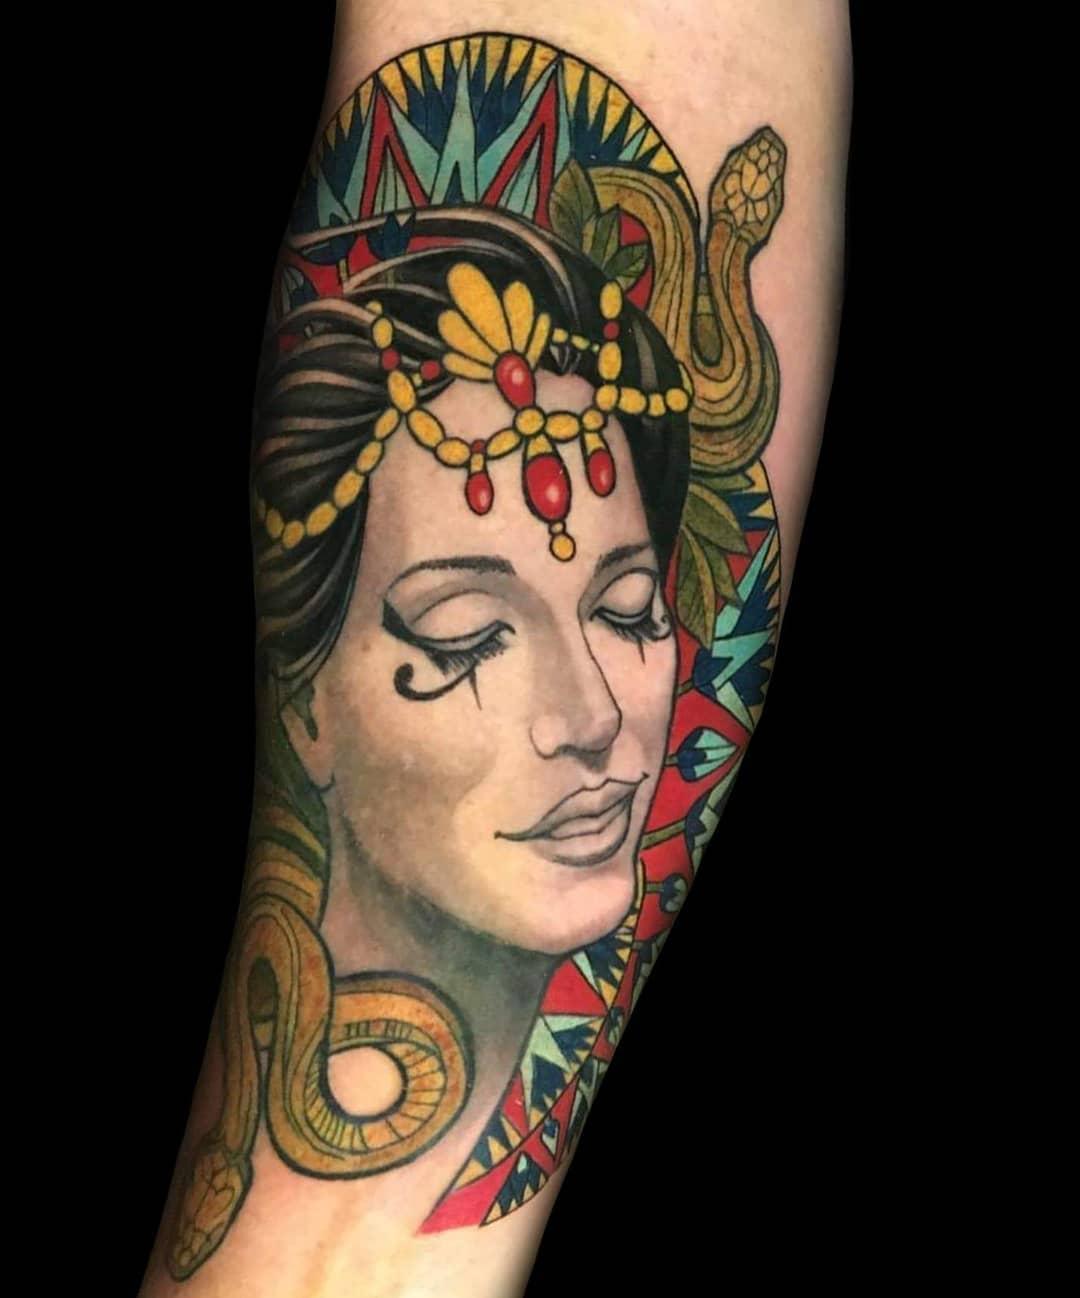 https://www.phoenixmag.com/wp-content/uploads/2019/06/divinity_tattoo.jpg